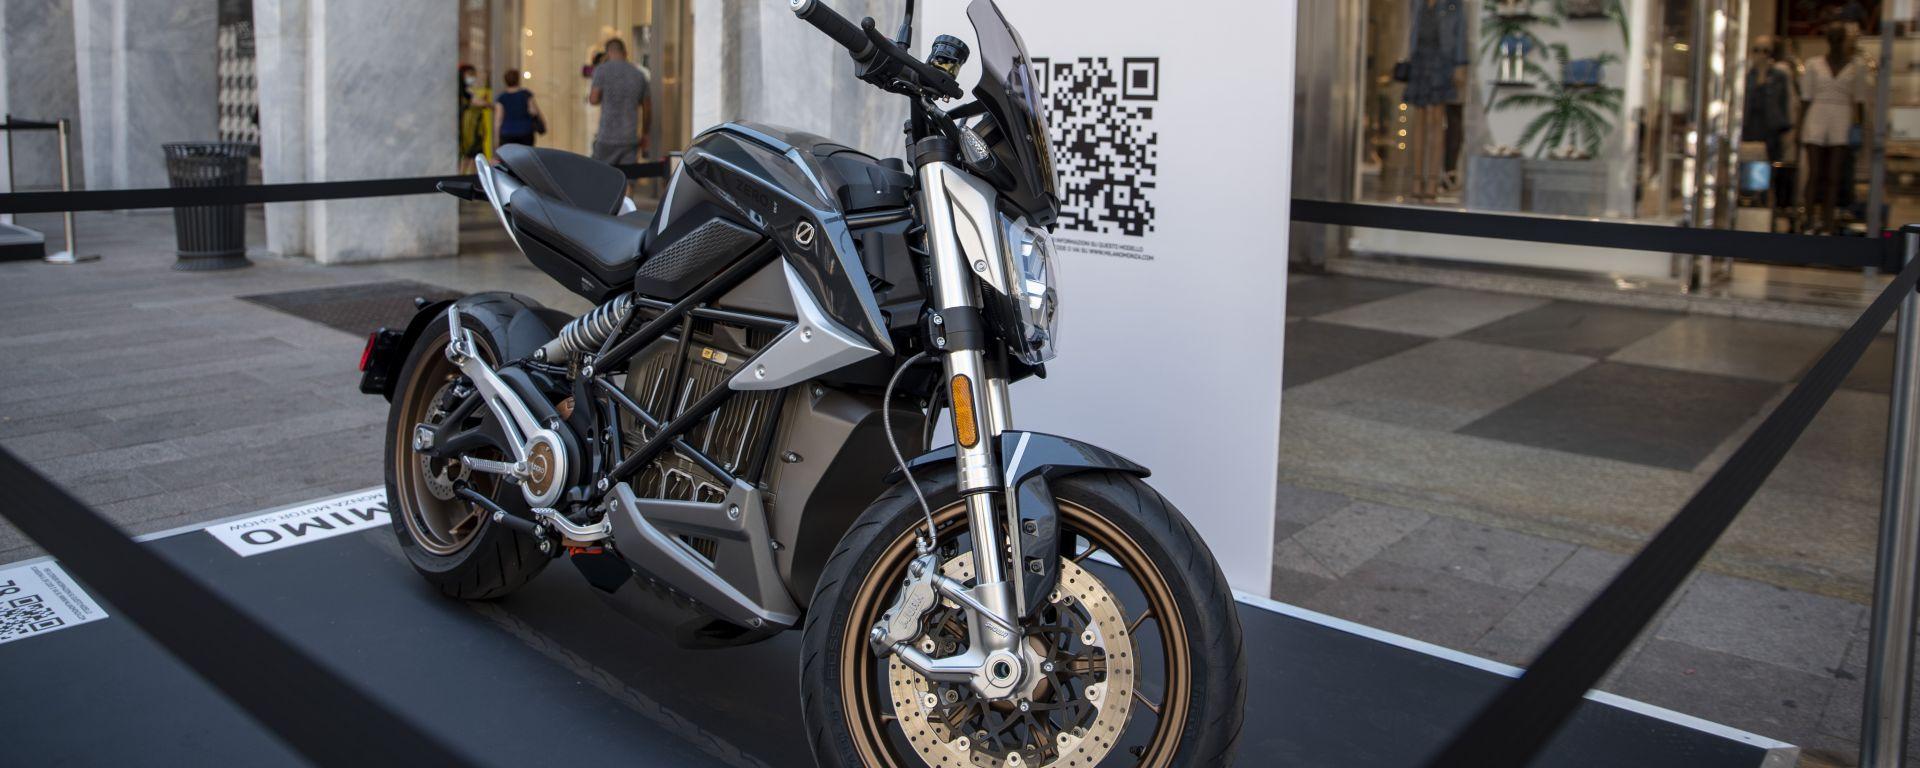 MIMO 2021: la Zero Motorcycles SR/F